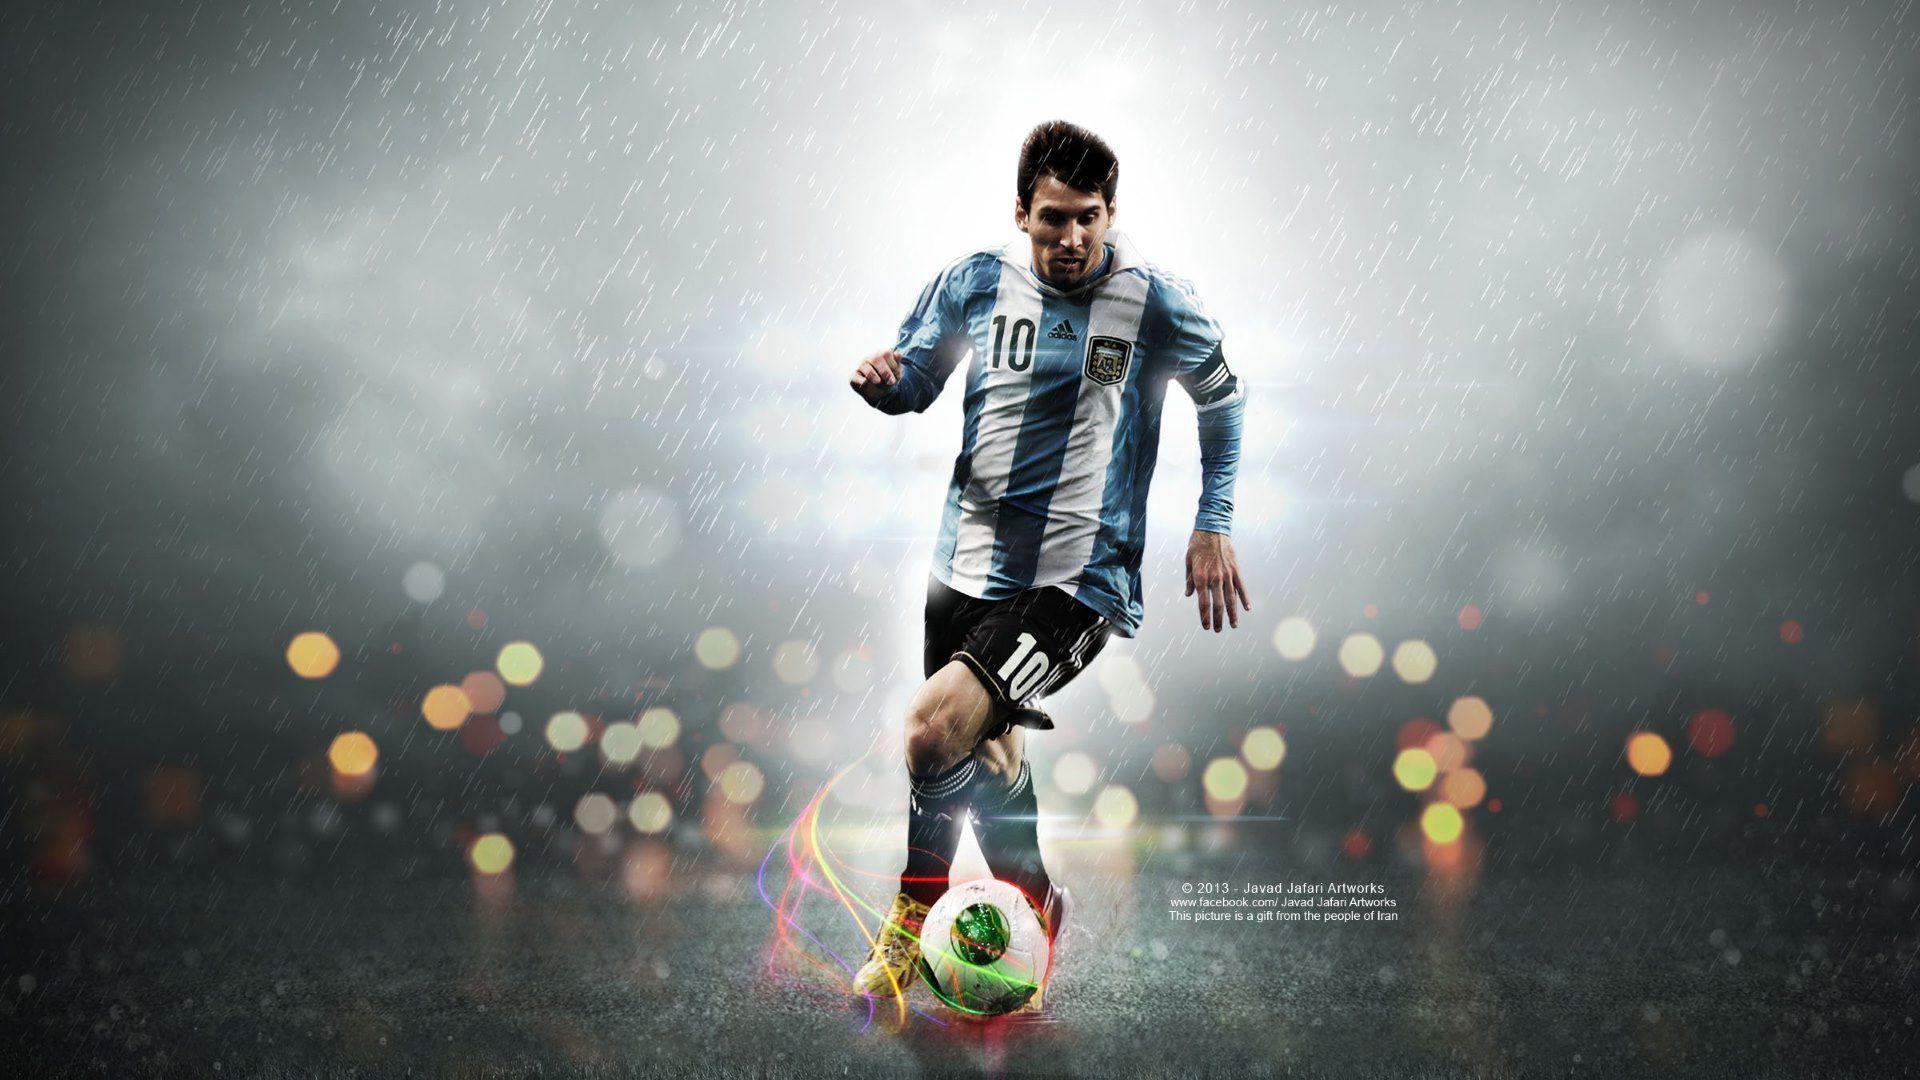 Messi Wallpaper Hd Vertical